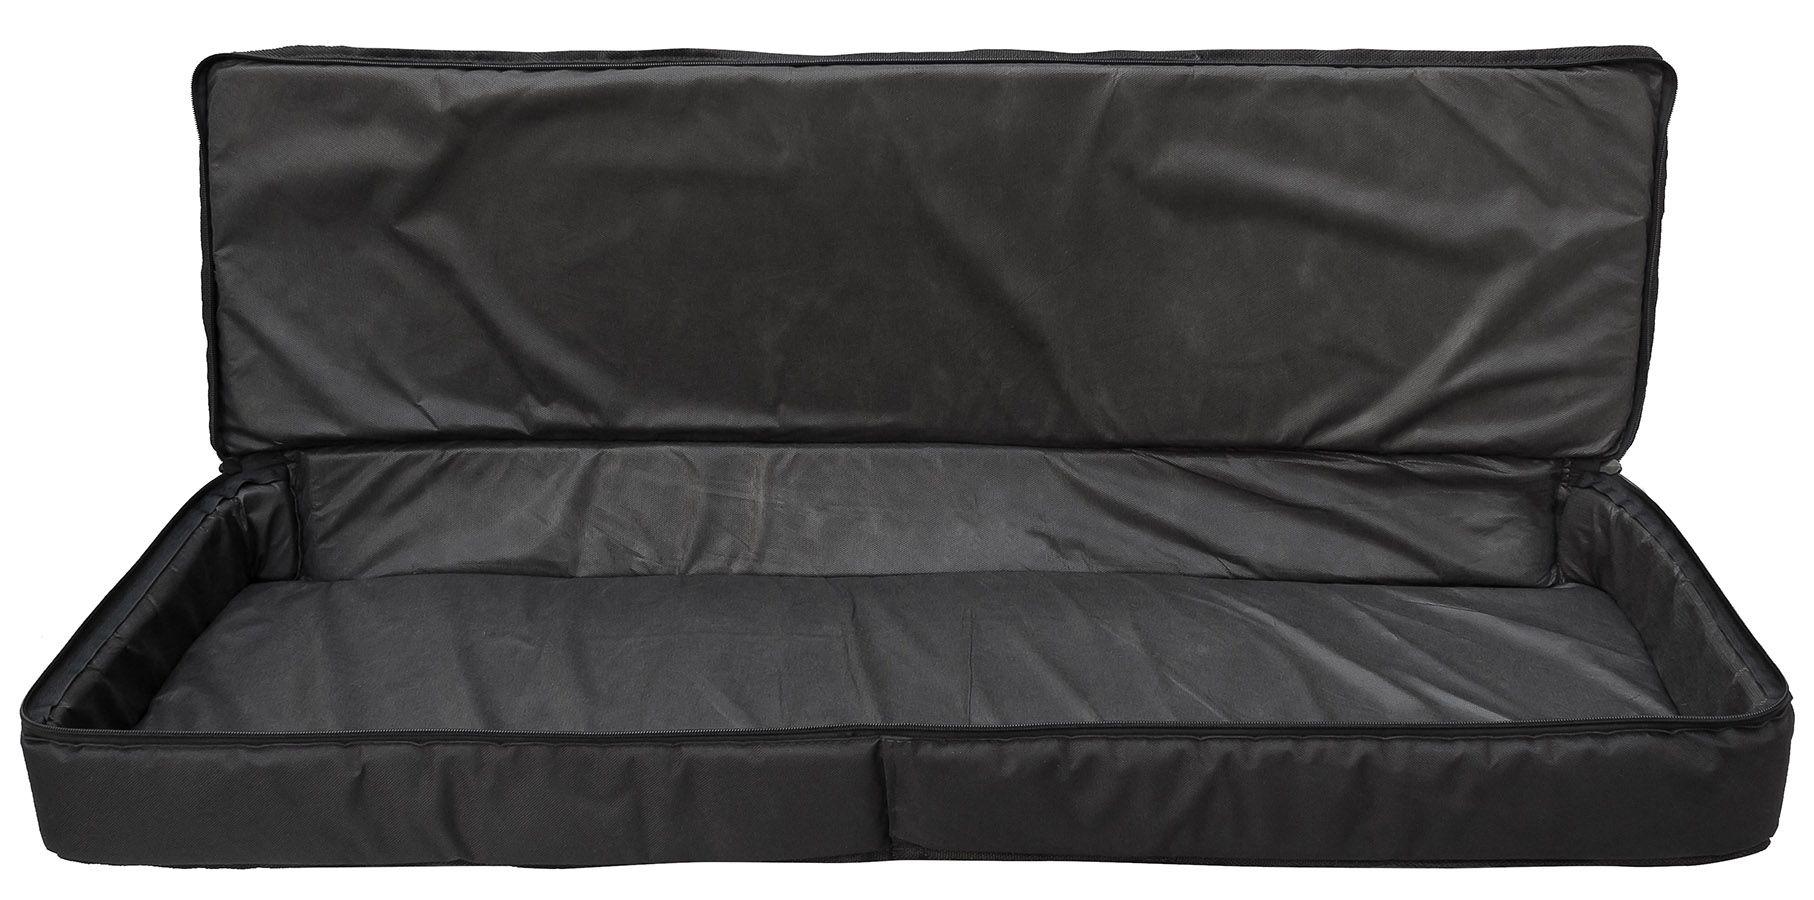 Capa Teclado Soft Case Start 5/8 P Almofadada - Preto